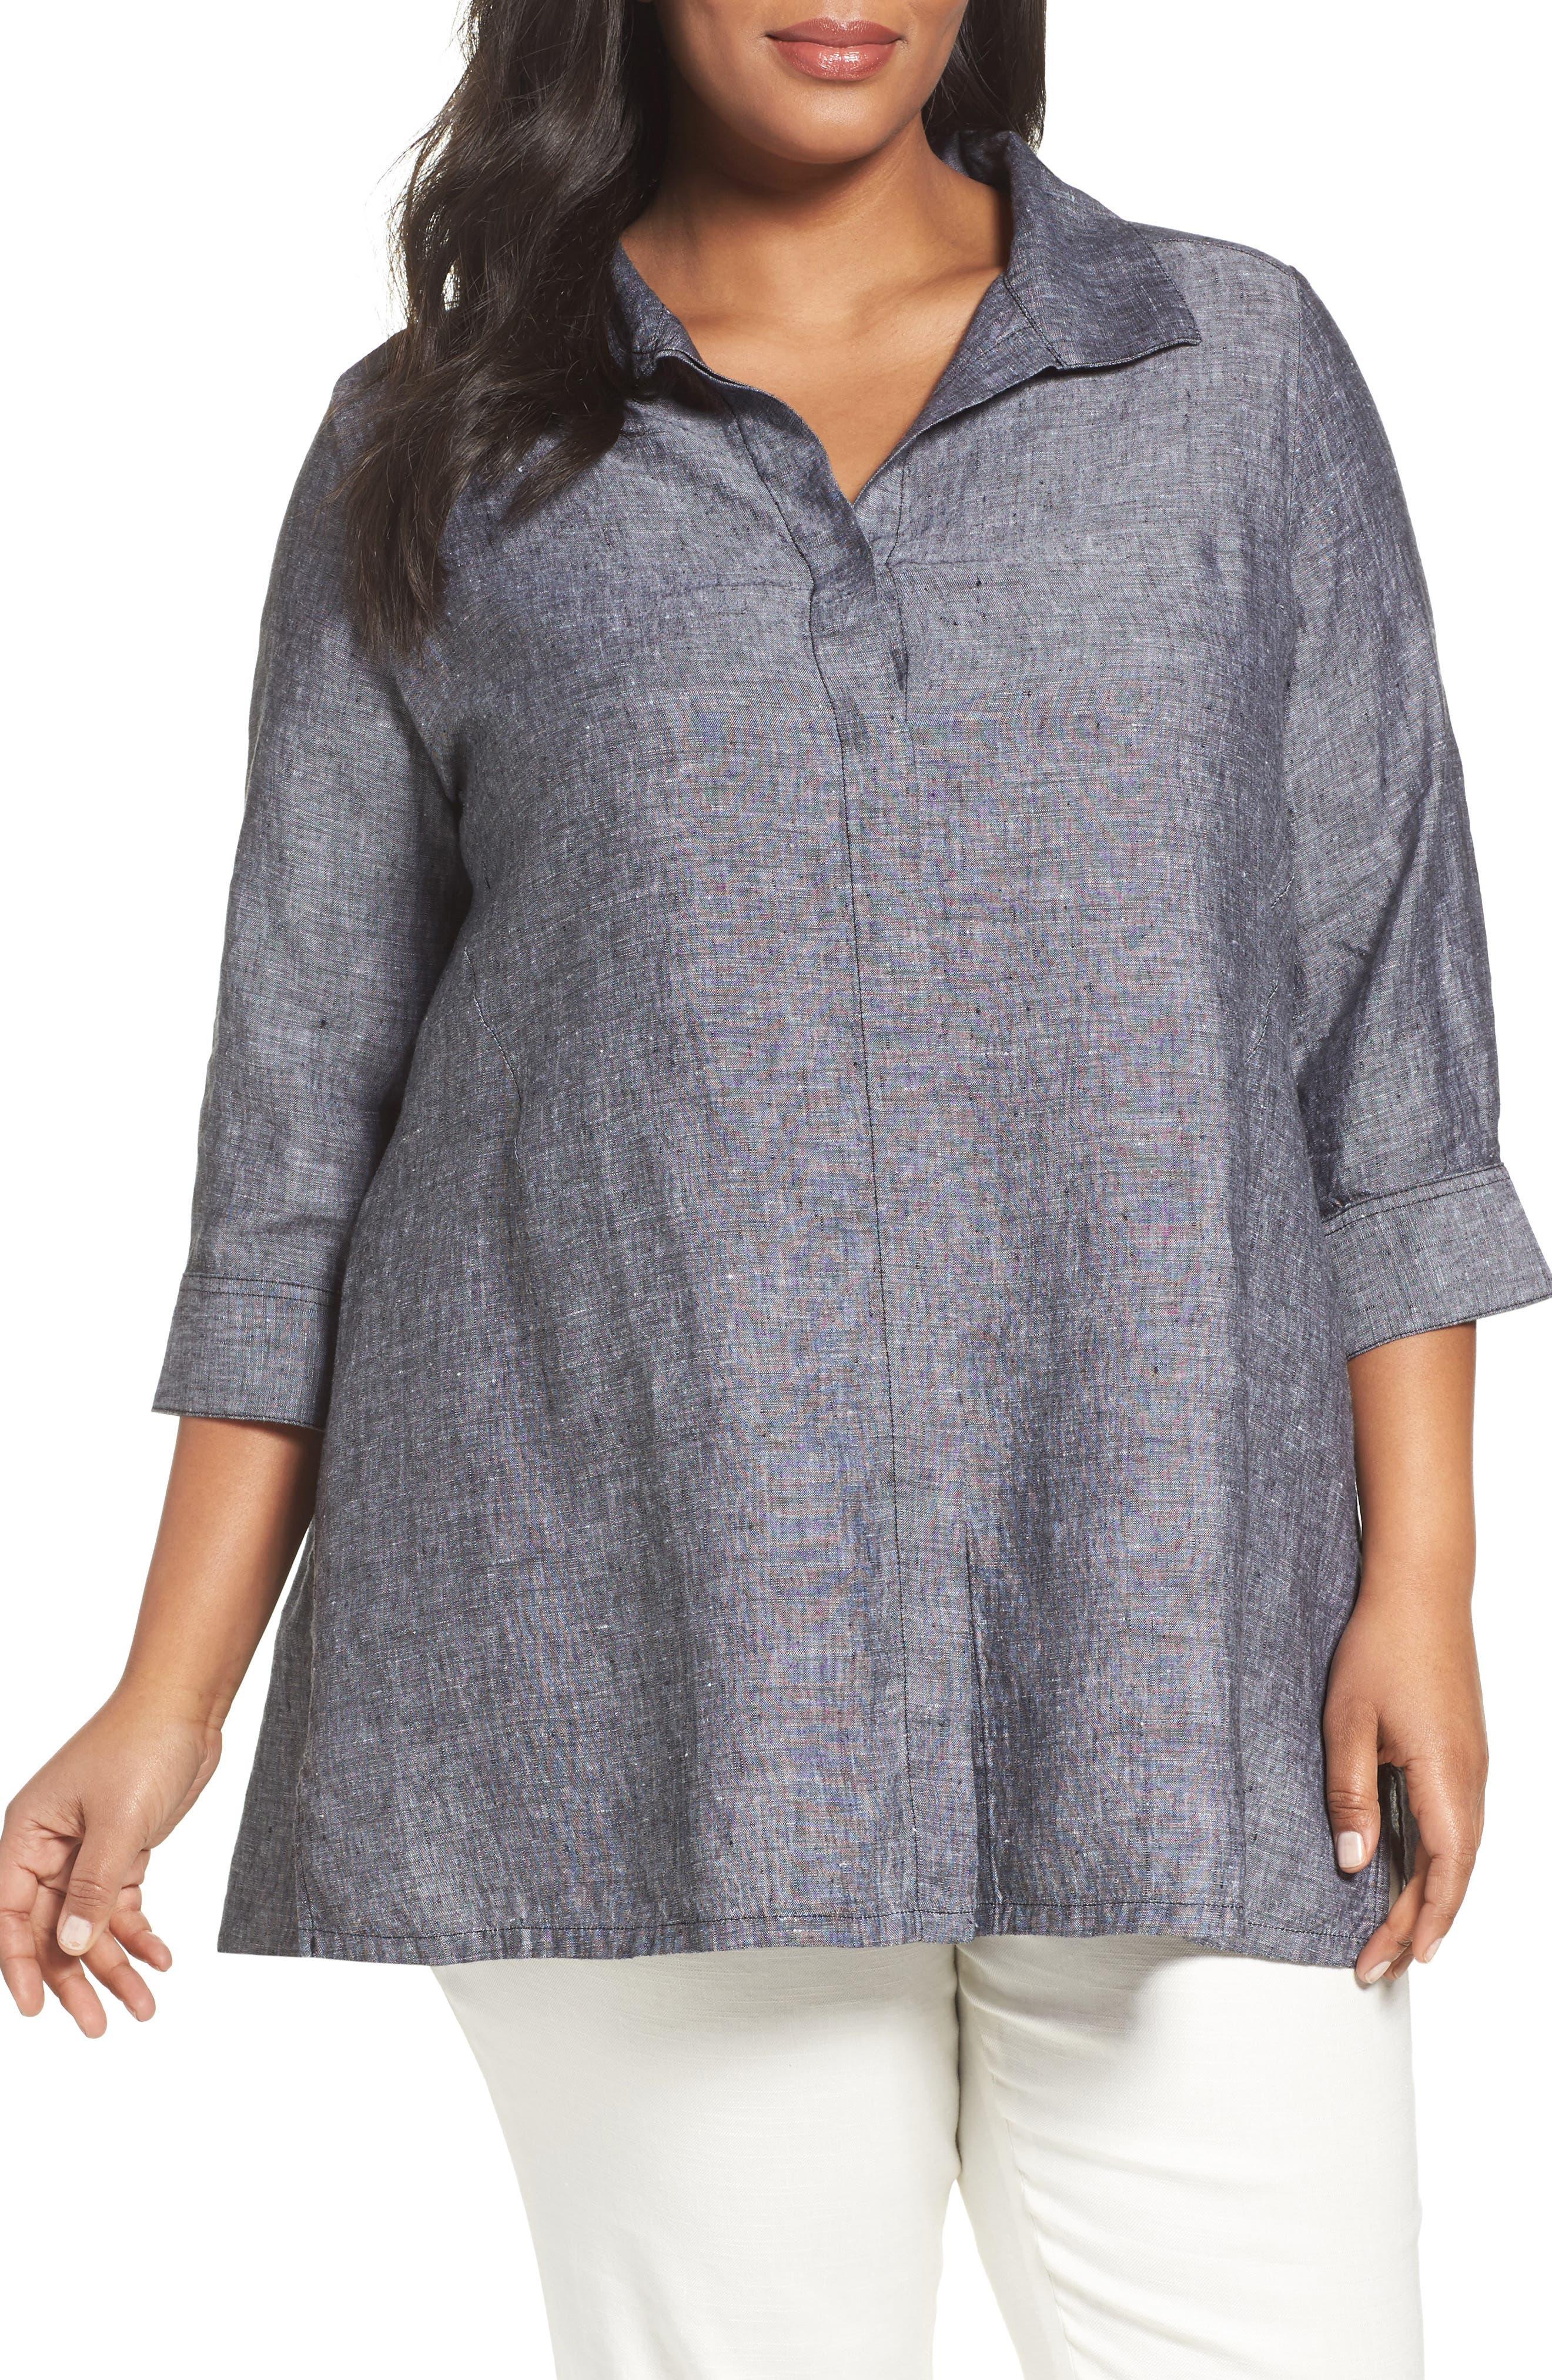 FOXCROFT, Chambray Linen Tunic Shirt, Main thumbnail 1, color, BLACK